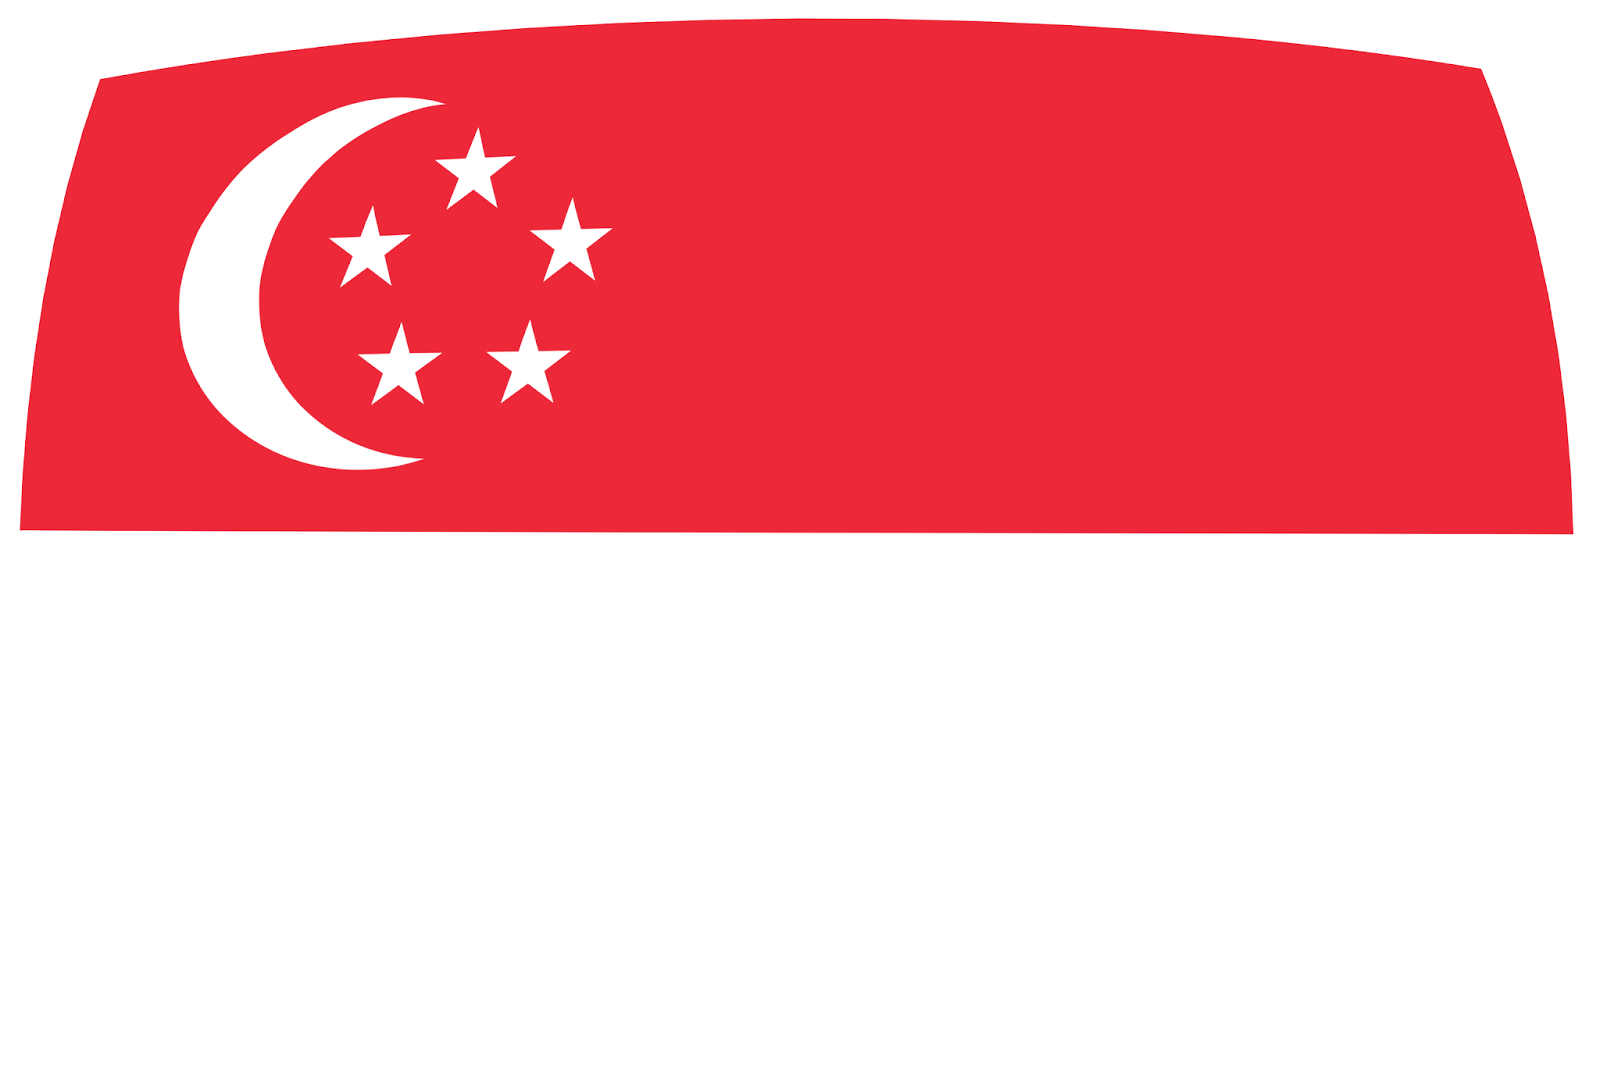 SSH Wuzz Singapura 22 Januari 2015